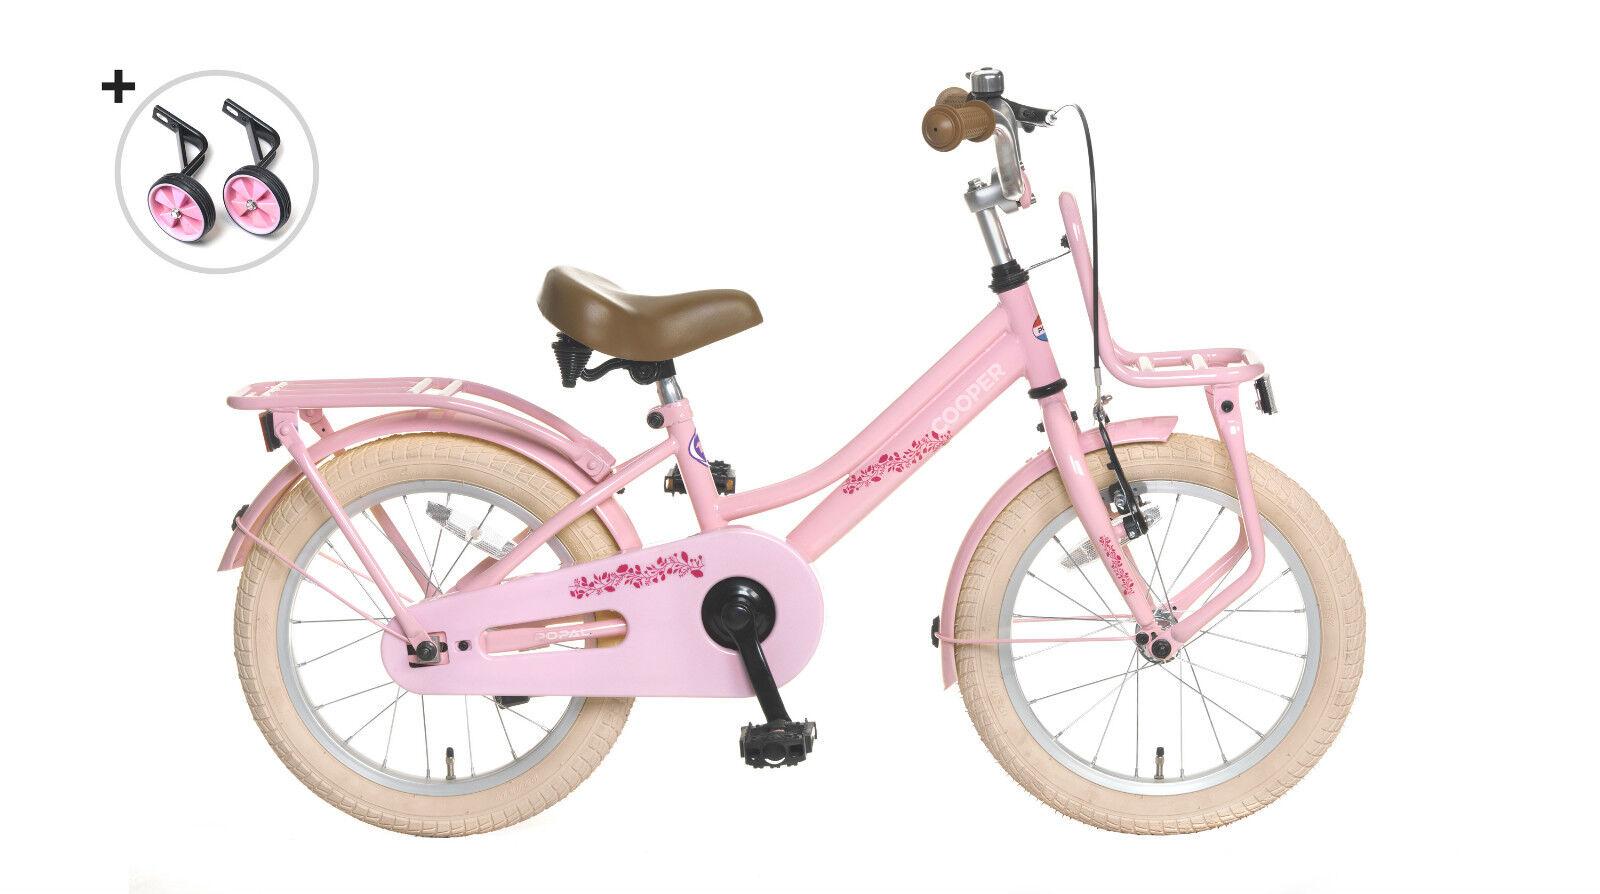 Kinderfahrrad Popal ``Cooper`` 14 Zoll in drei Varianten  Kinderrad  1453